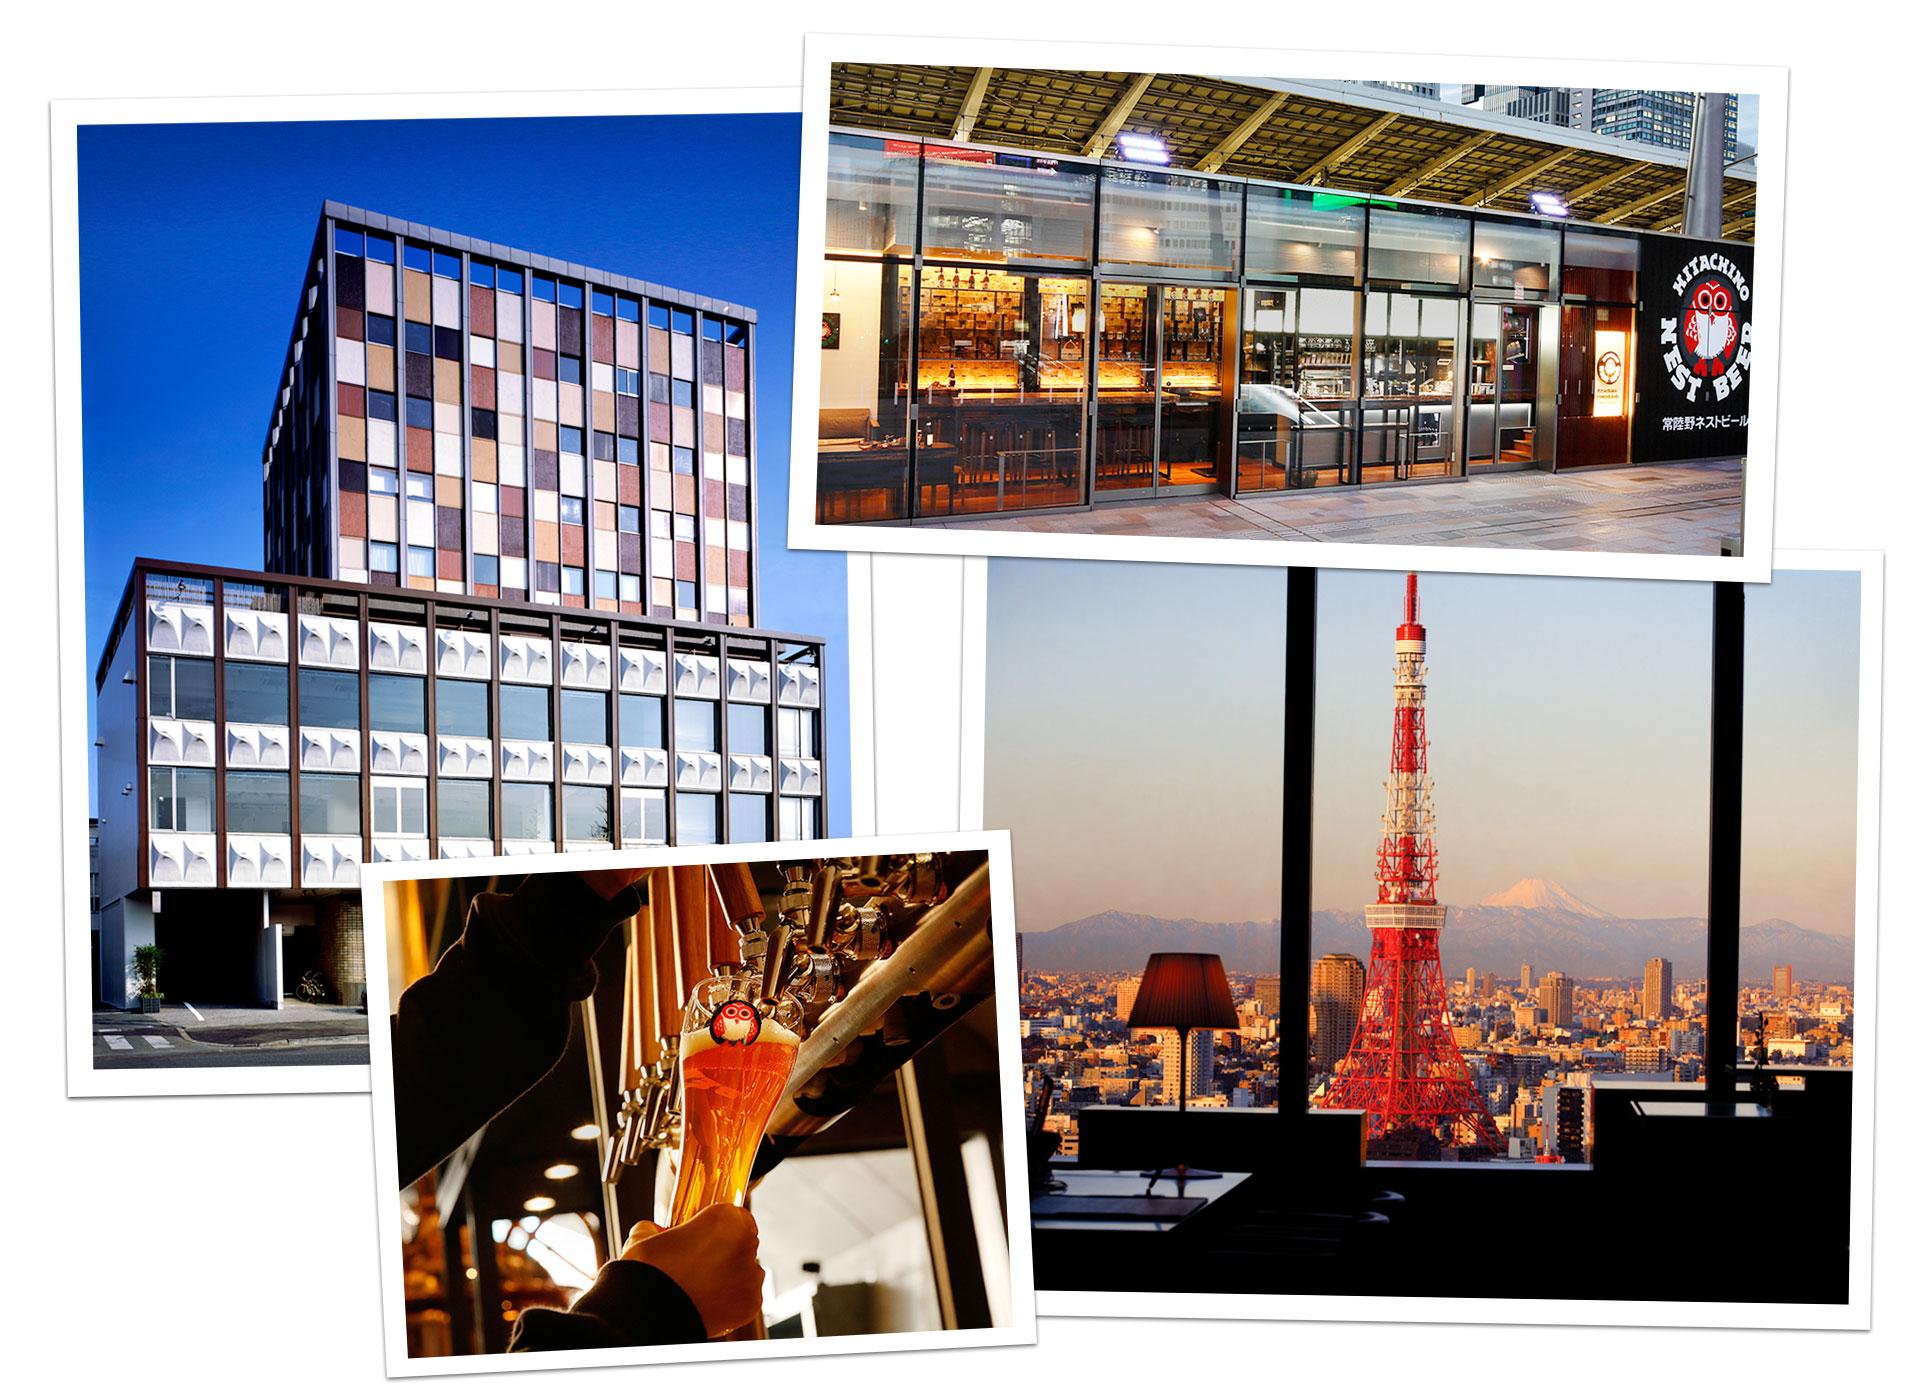 Claska, Hitachino Beer & Park Hotel Tokyo